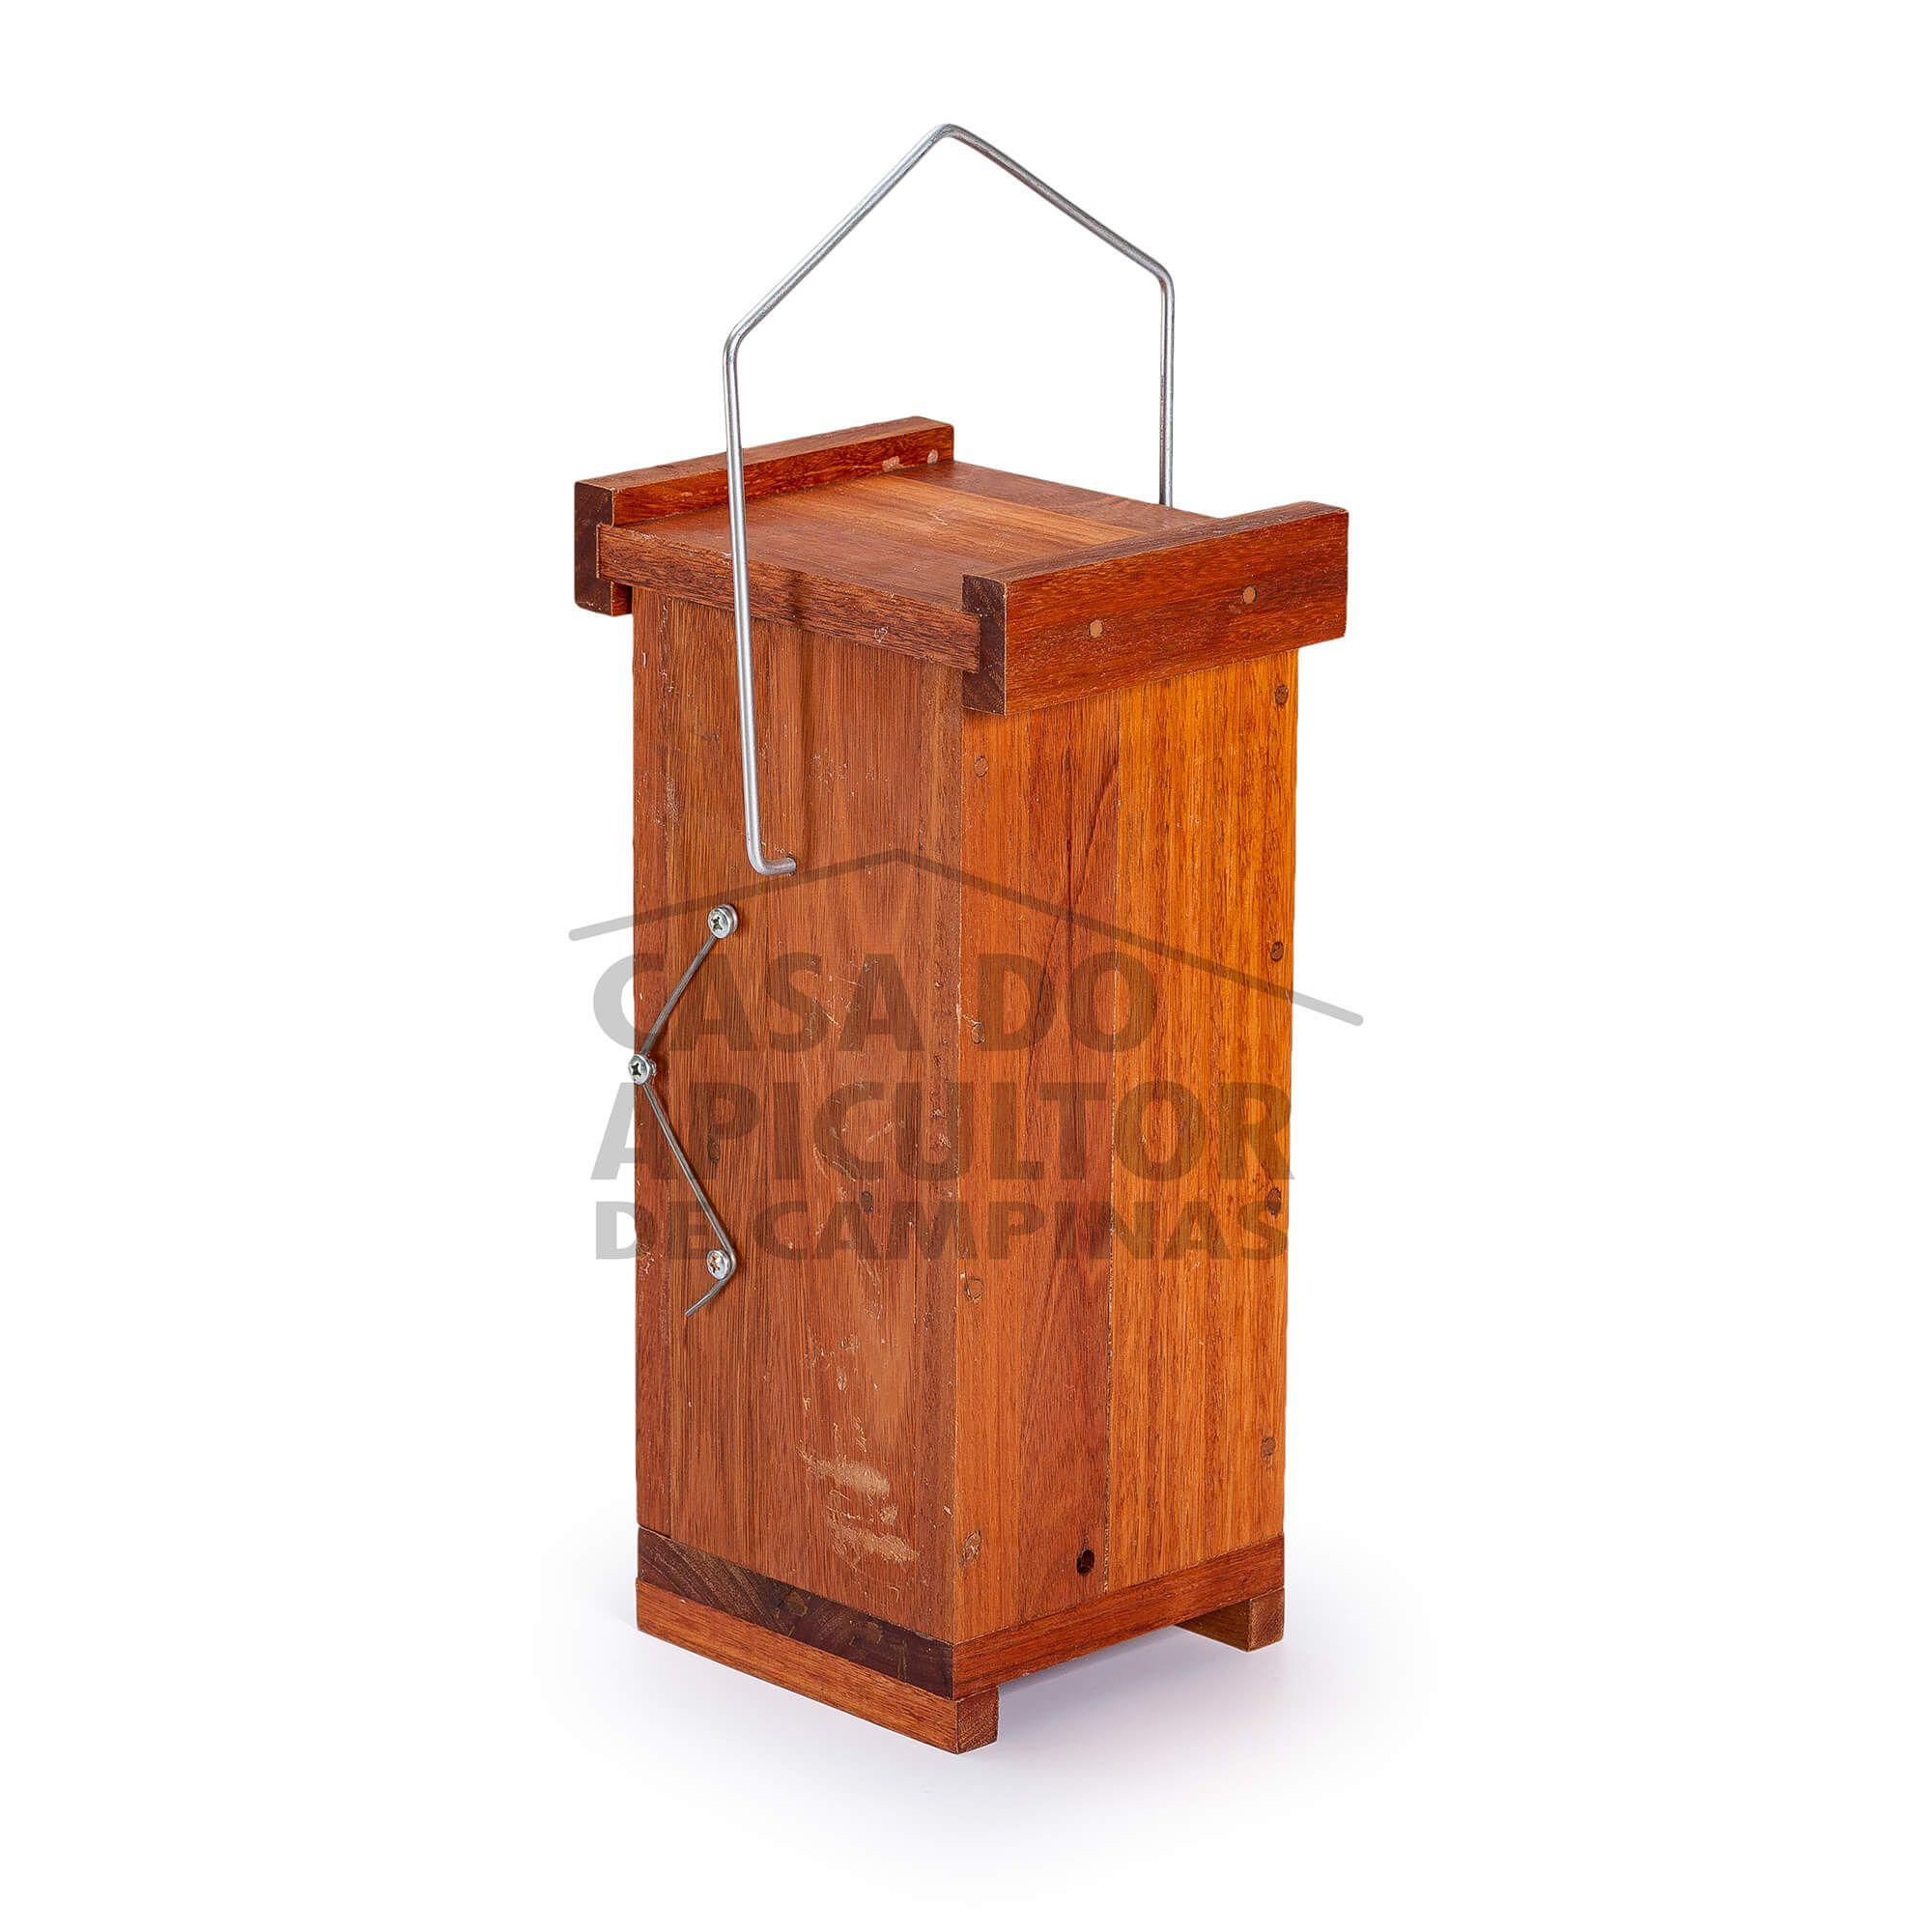 Colmeia Abelha Jatai - Modelo Vertical Eucalipto